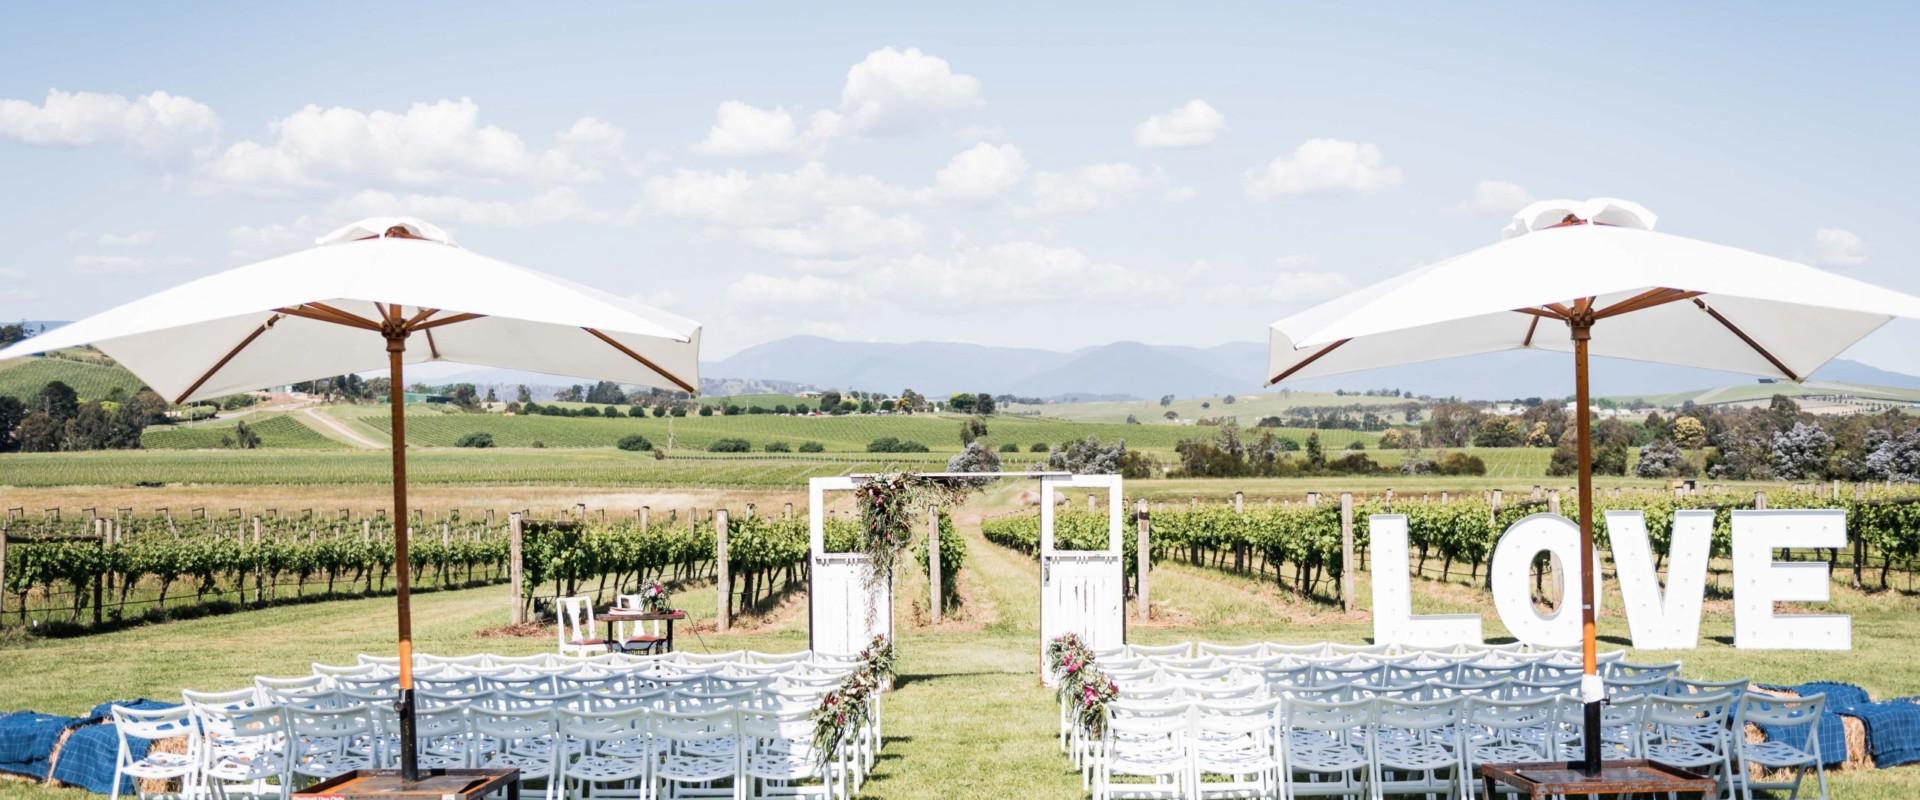 Acacia Ridge Winery Wedding, Ceremony, Yarra Glen, Melbourne